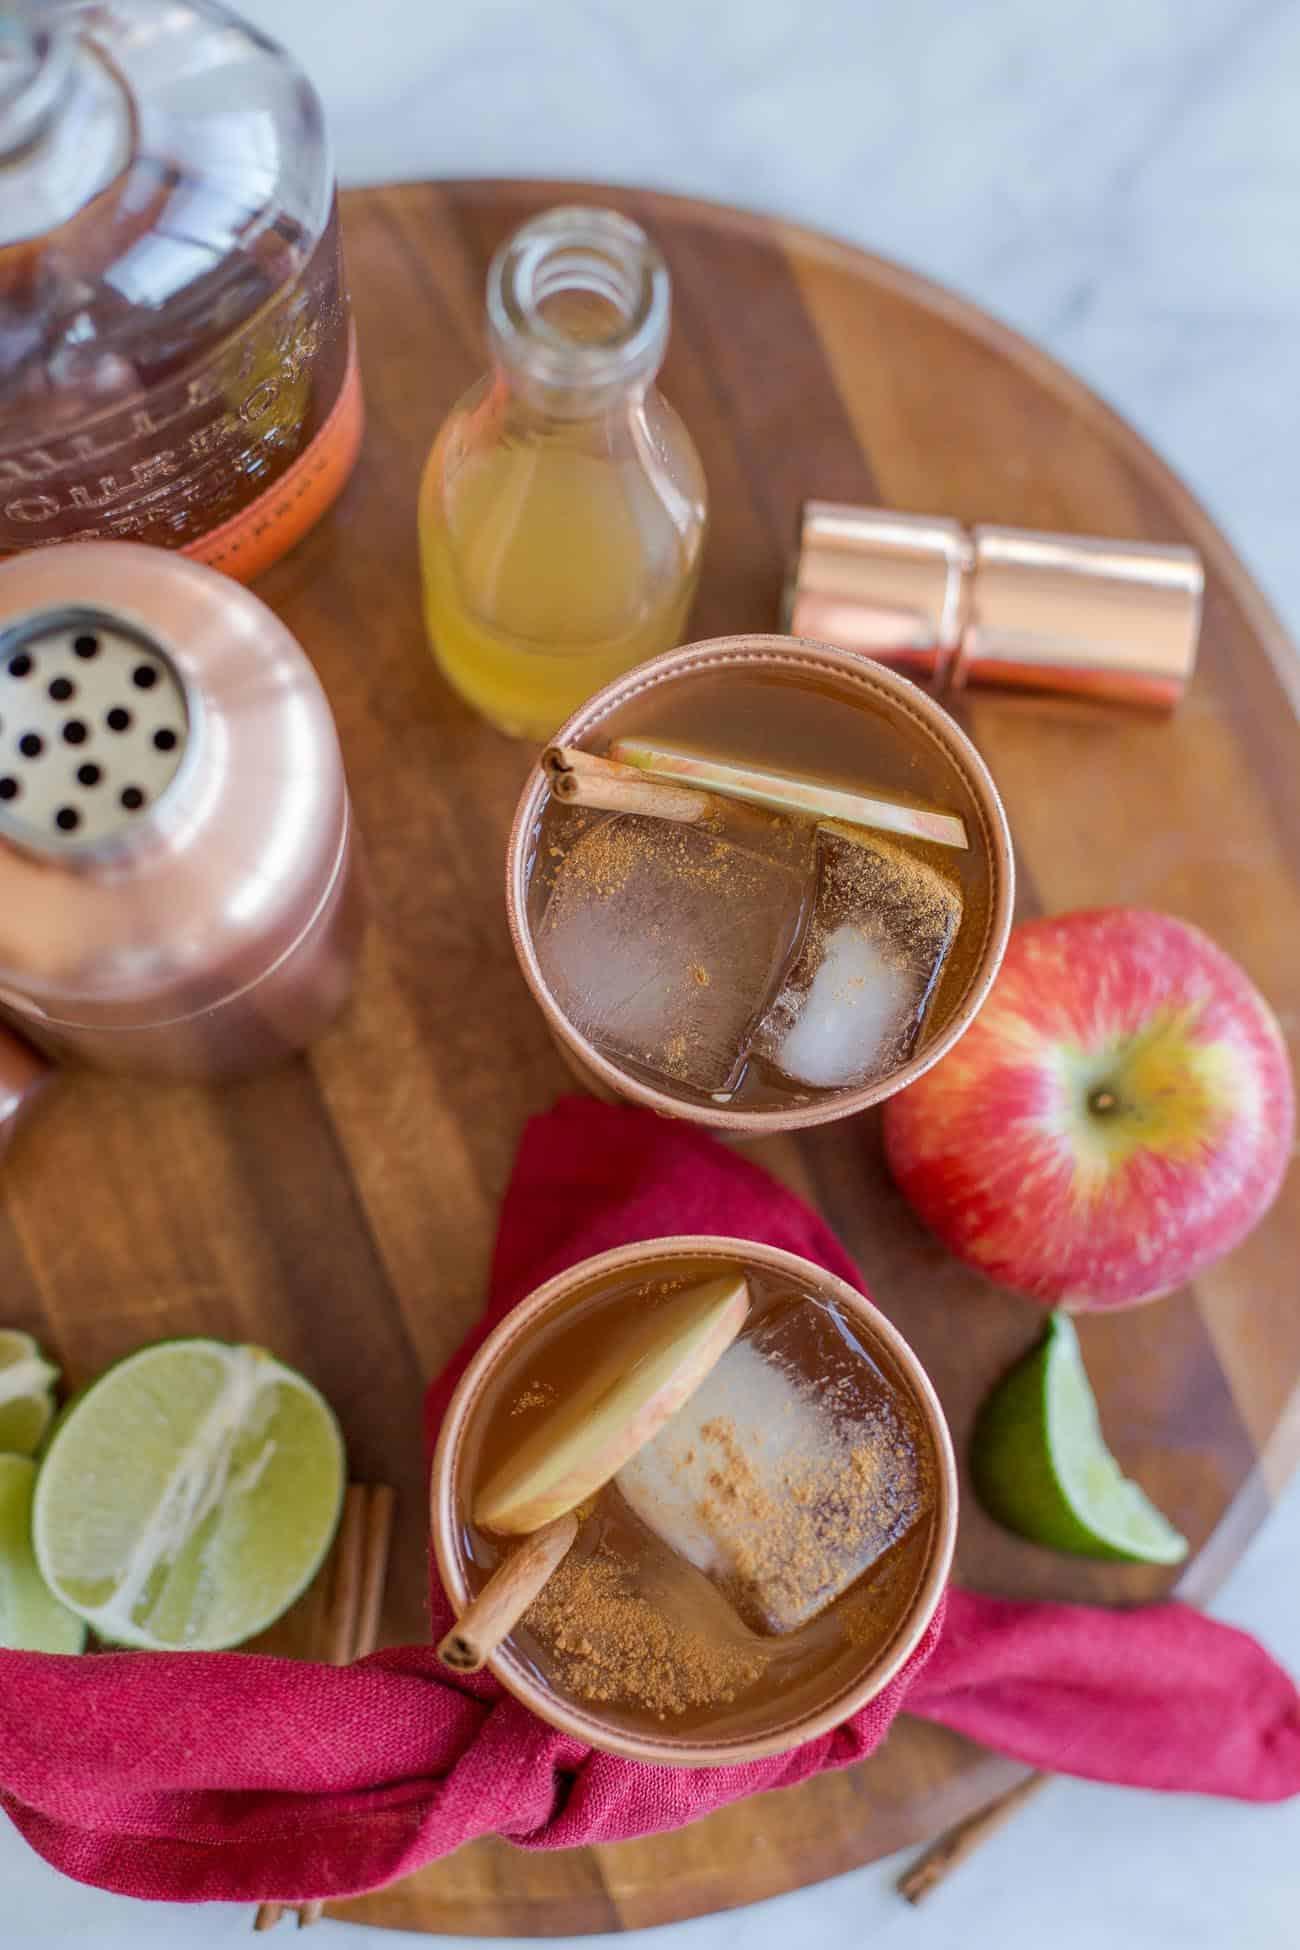 apple cider julep recipe, fall cocktails, holiday cocktails with apples, apple cider cocktail - My Style Vita @mystylevita